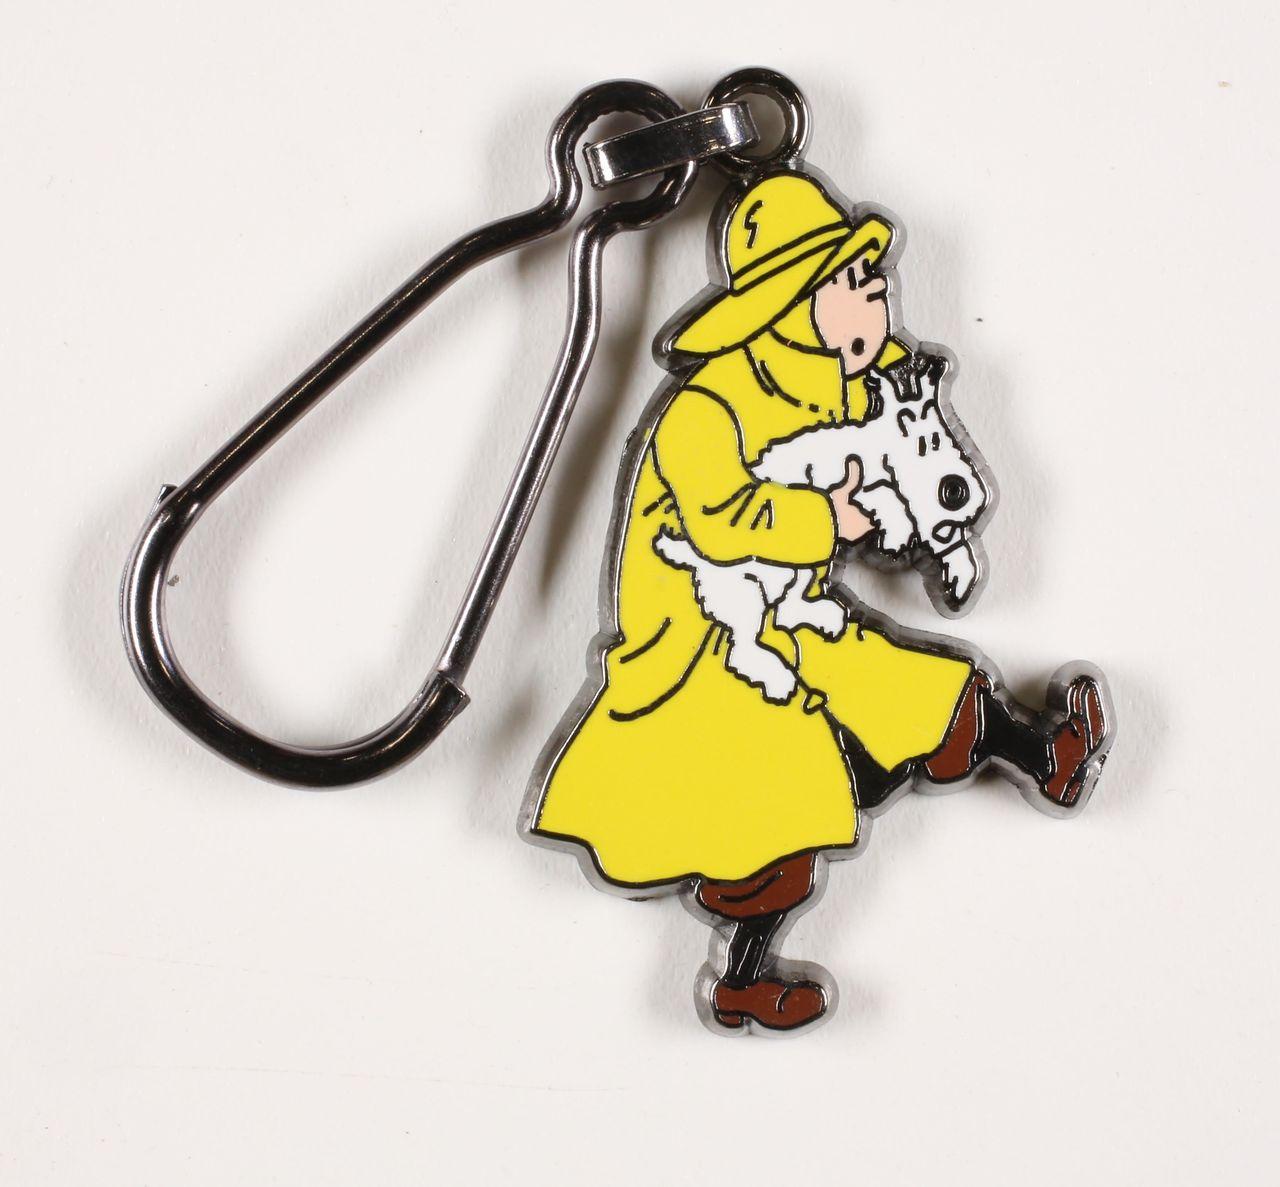 Figurine métal Tintin Tintin en imperméable sauve Milou bas relief Corner